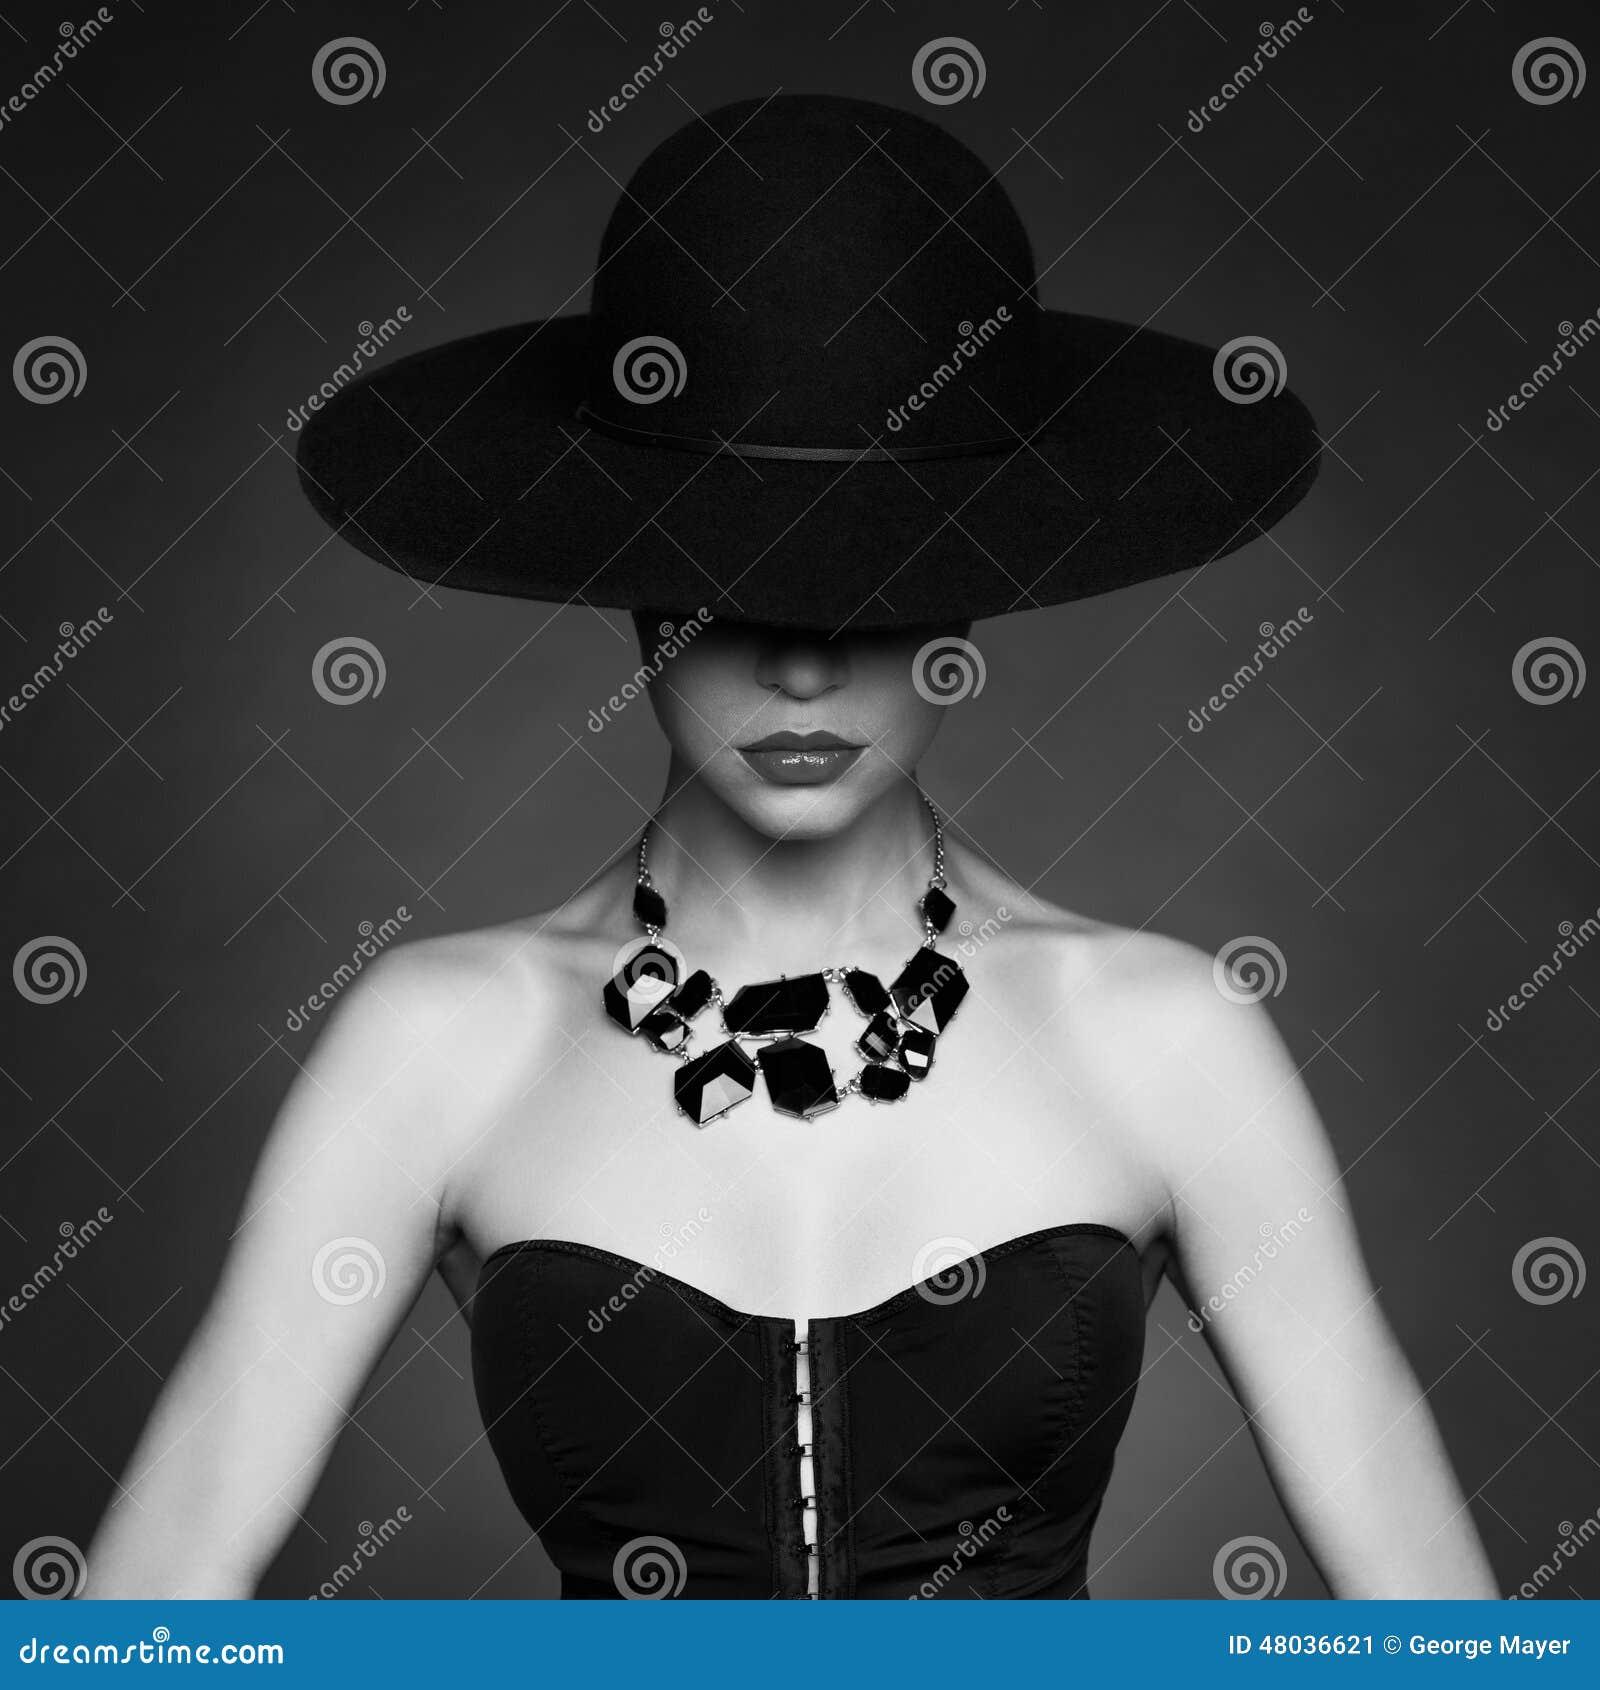 Classy And Glamorous Photo: Elegant Lady In Hat Stock Photo